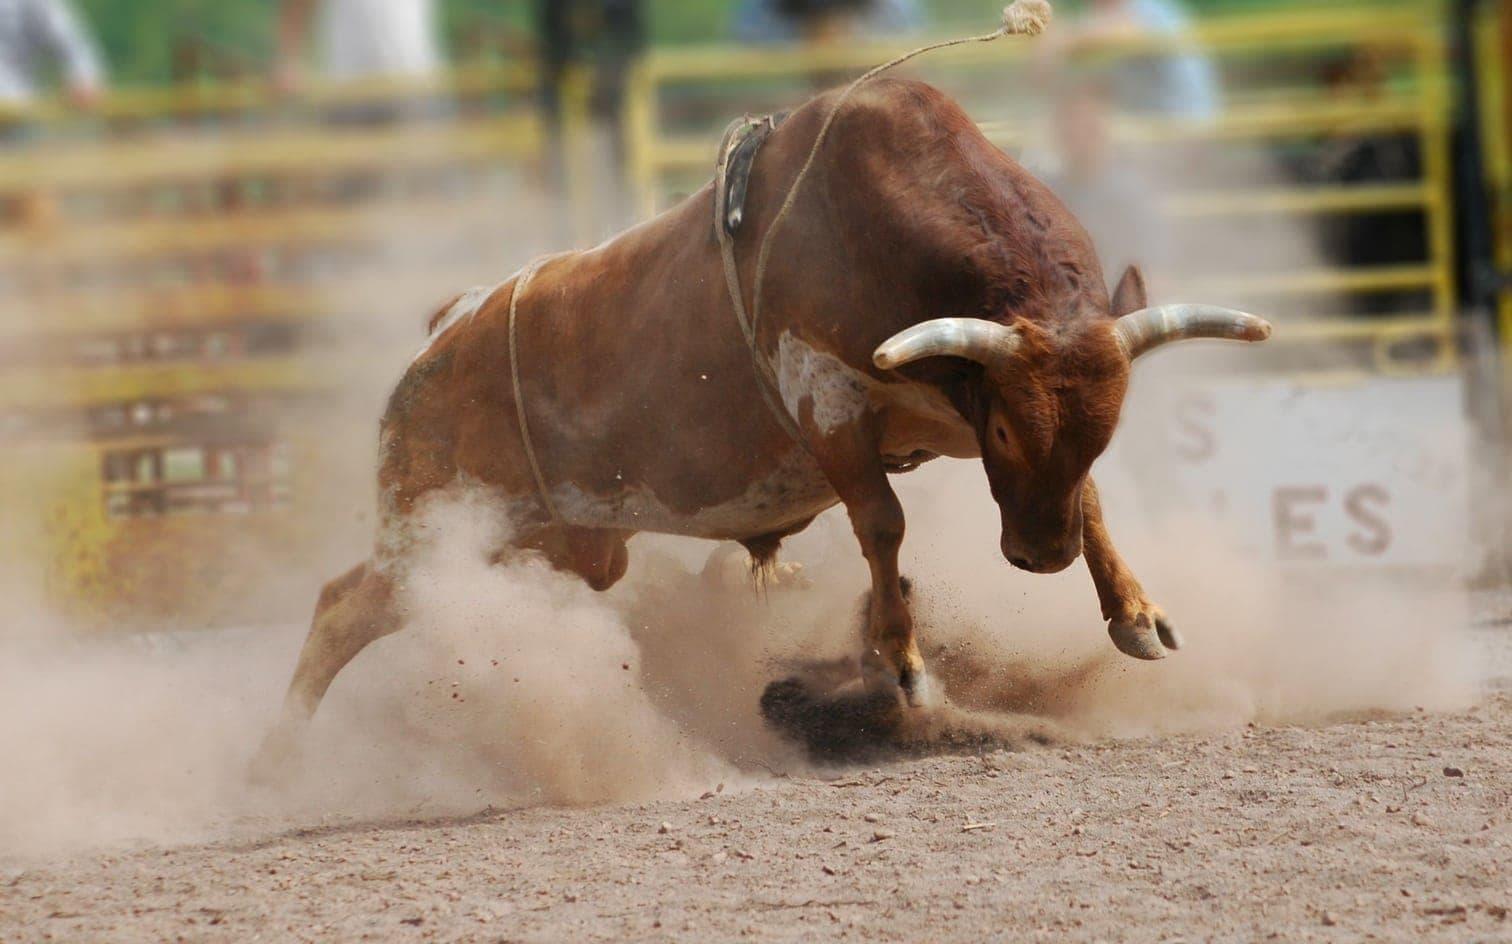 Foto: Shawn Hine / Shutterstock.com (Symbolbild)